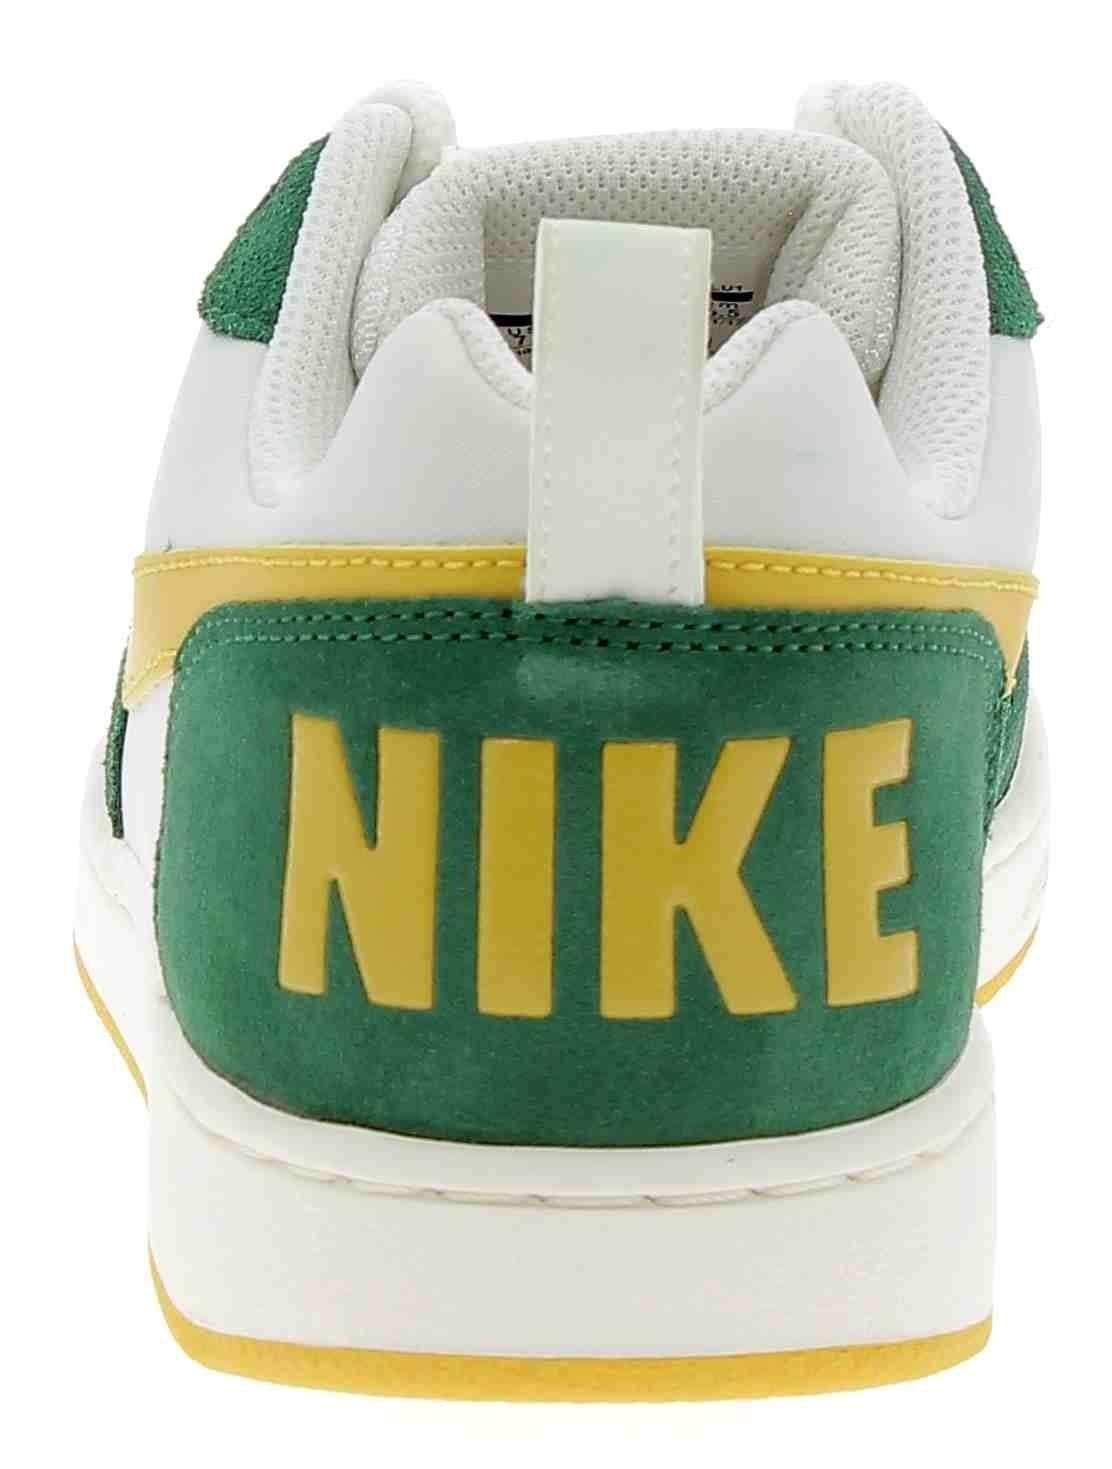 wholesale dealer 5f1b6 787d3 Nike - Nike Court Borough Low Prem Scarpe Sportive Uomo Bianche Verdi   Amazon.it  Sport e tempo libero